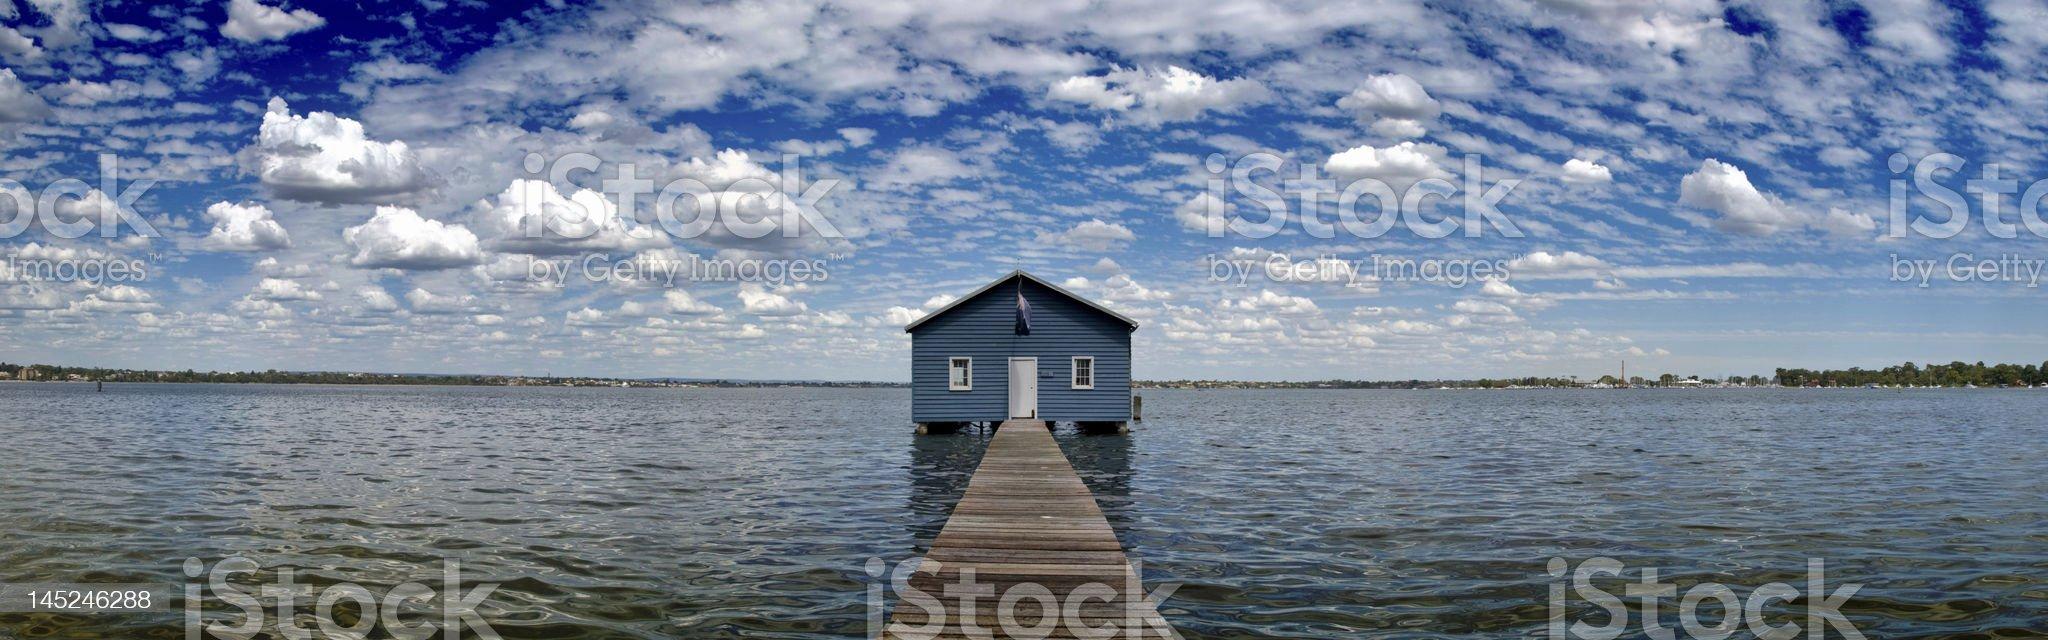 Crawley Edge (Matilda Bay) Boatshed, Perth, Western Australia royalty-free stock photo